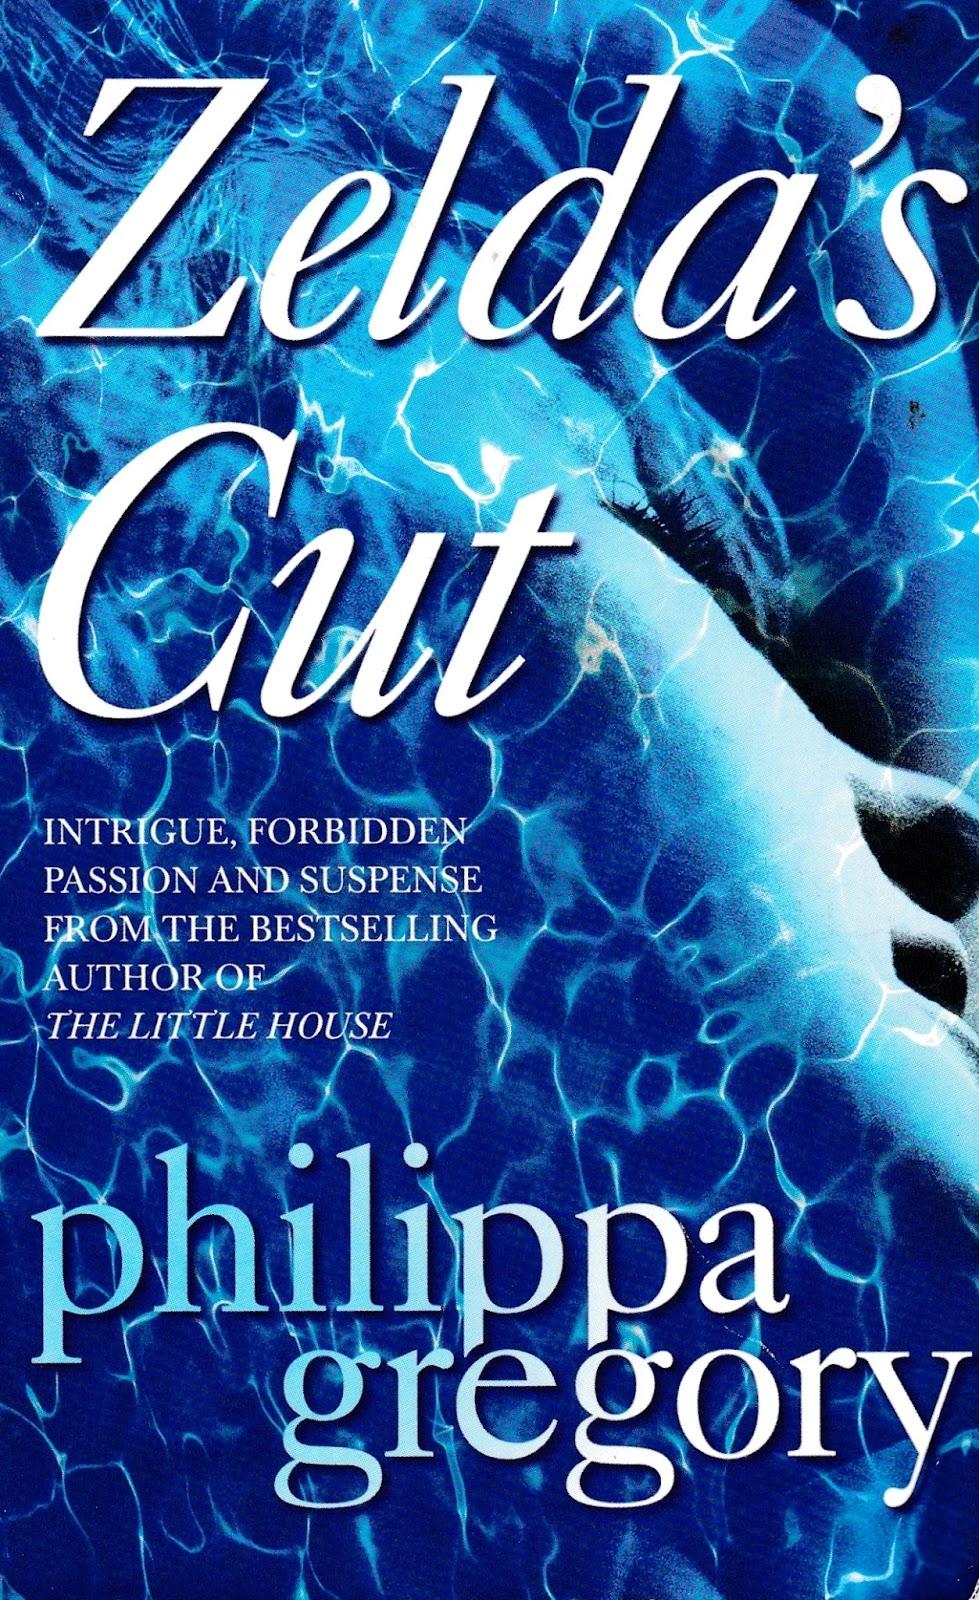 Zelda's Cut US Cover